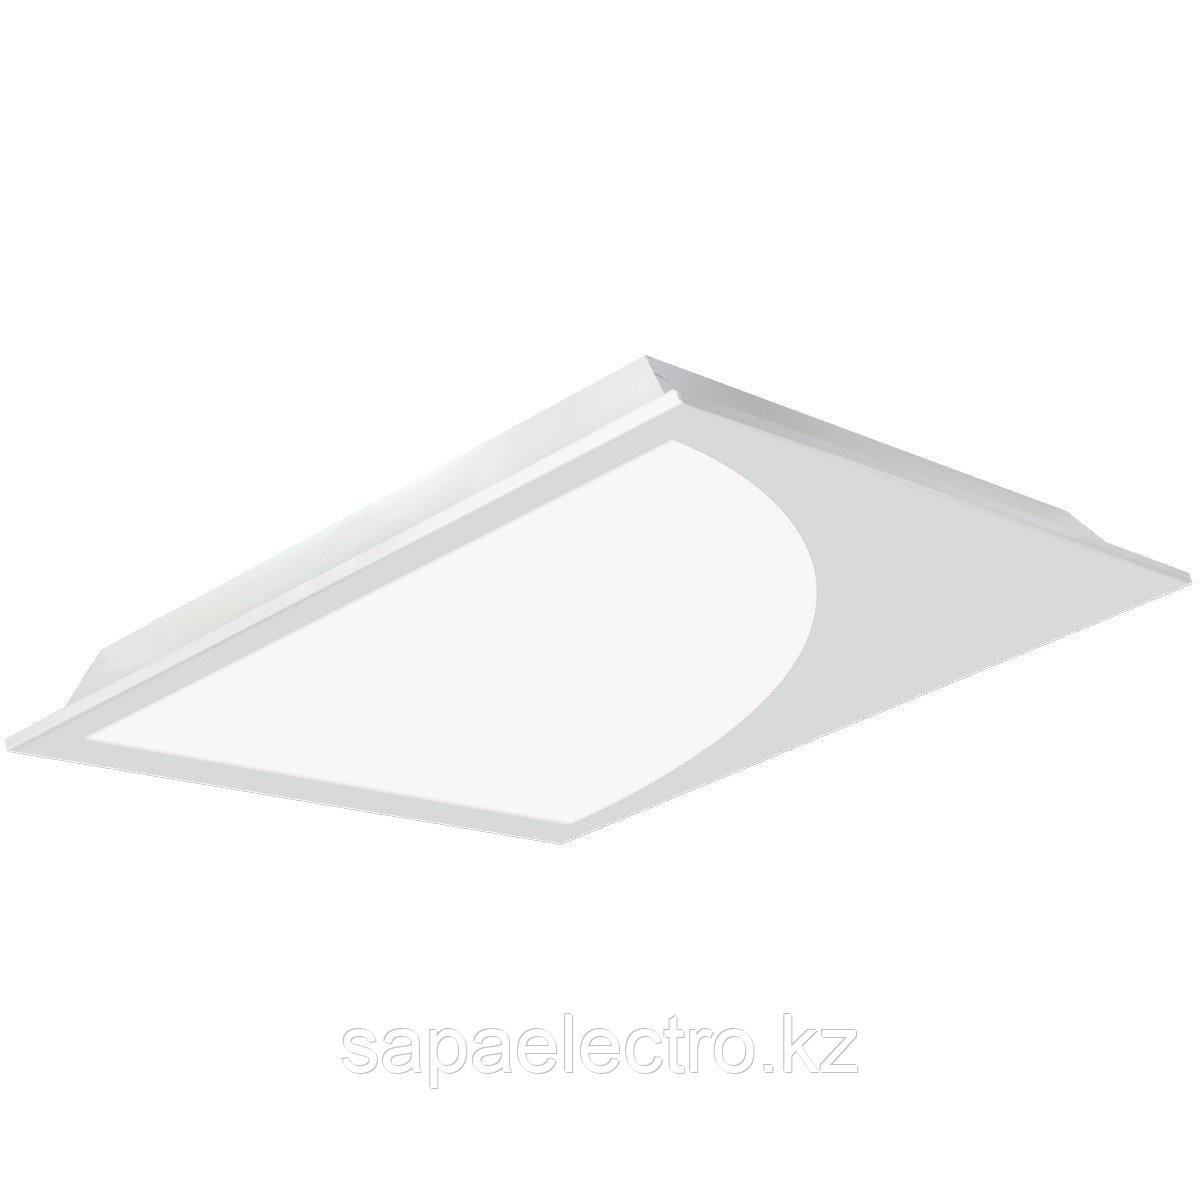 Св-к  OPALLED PLANET 48W WH S/A  600x600 5700K  MGL